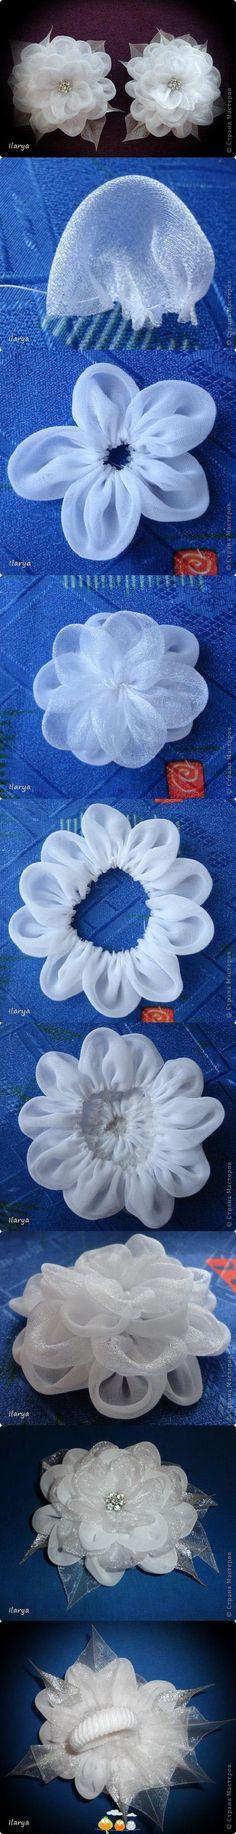 Sheer fabric flowers.                                                                                                                                                      More